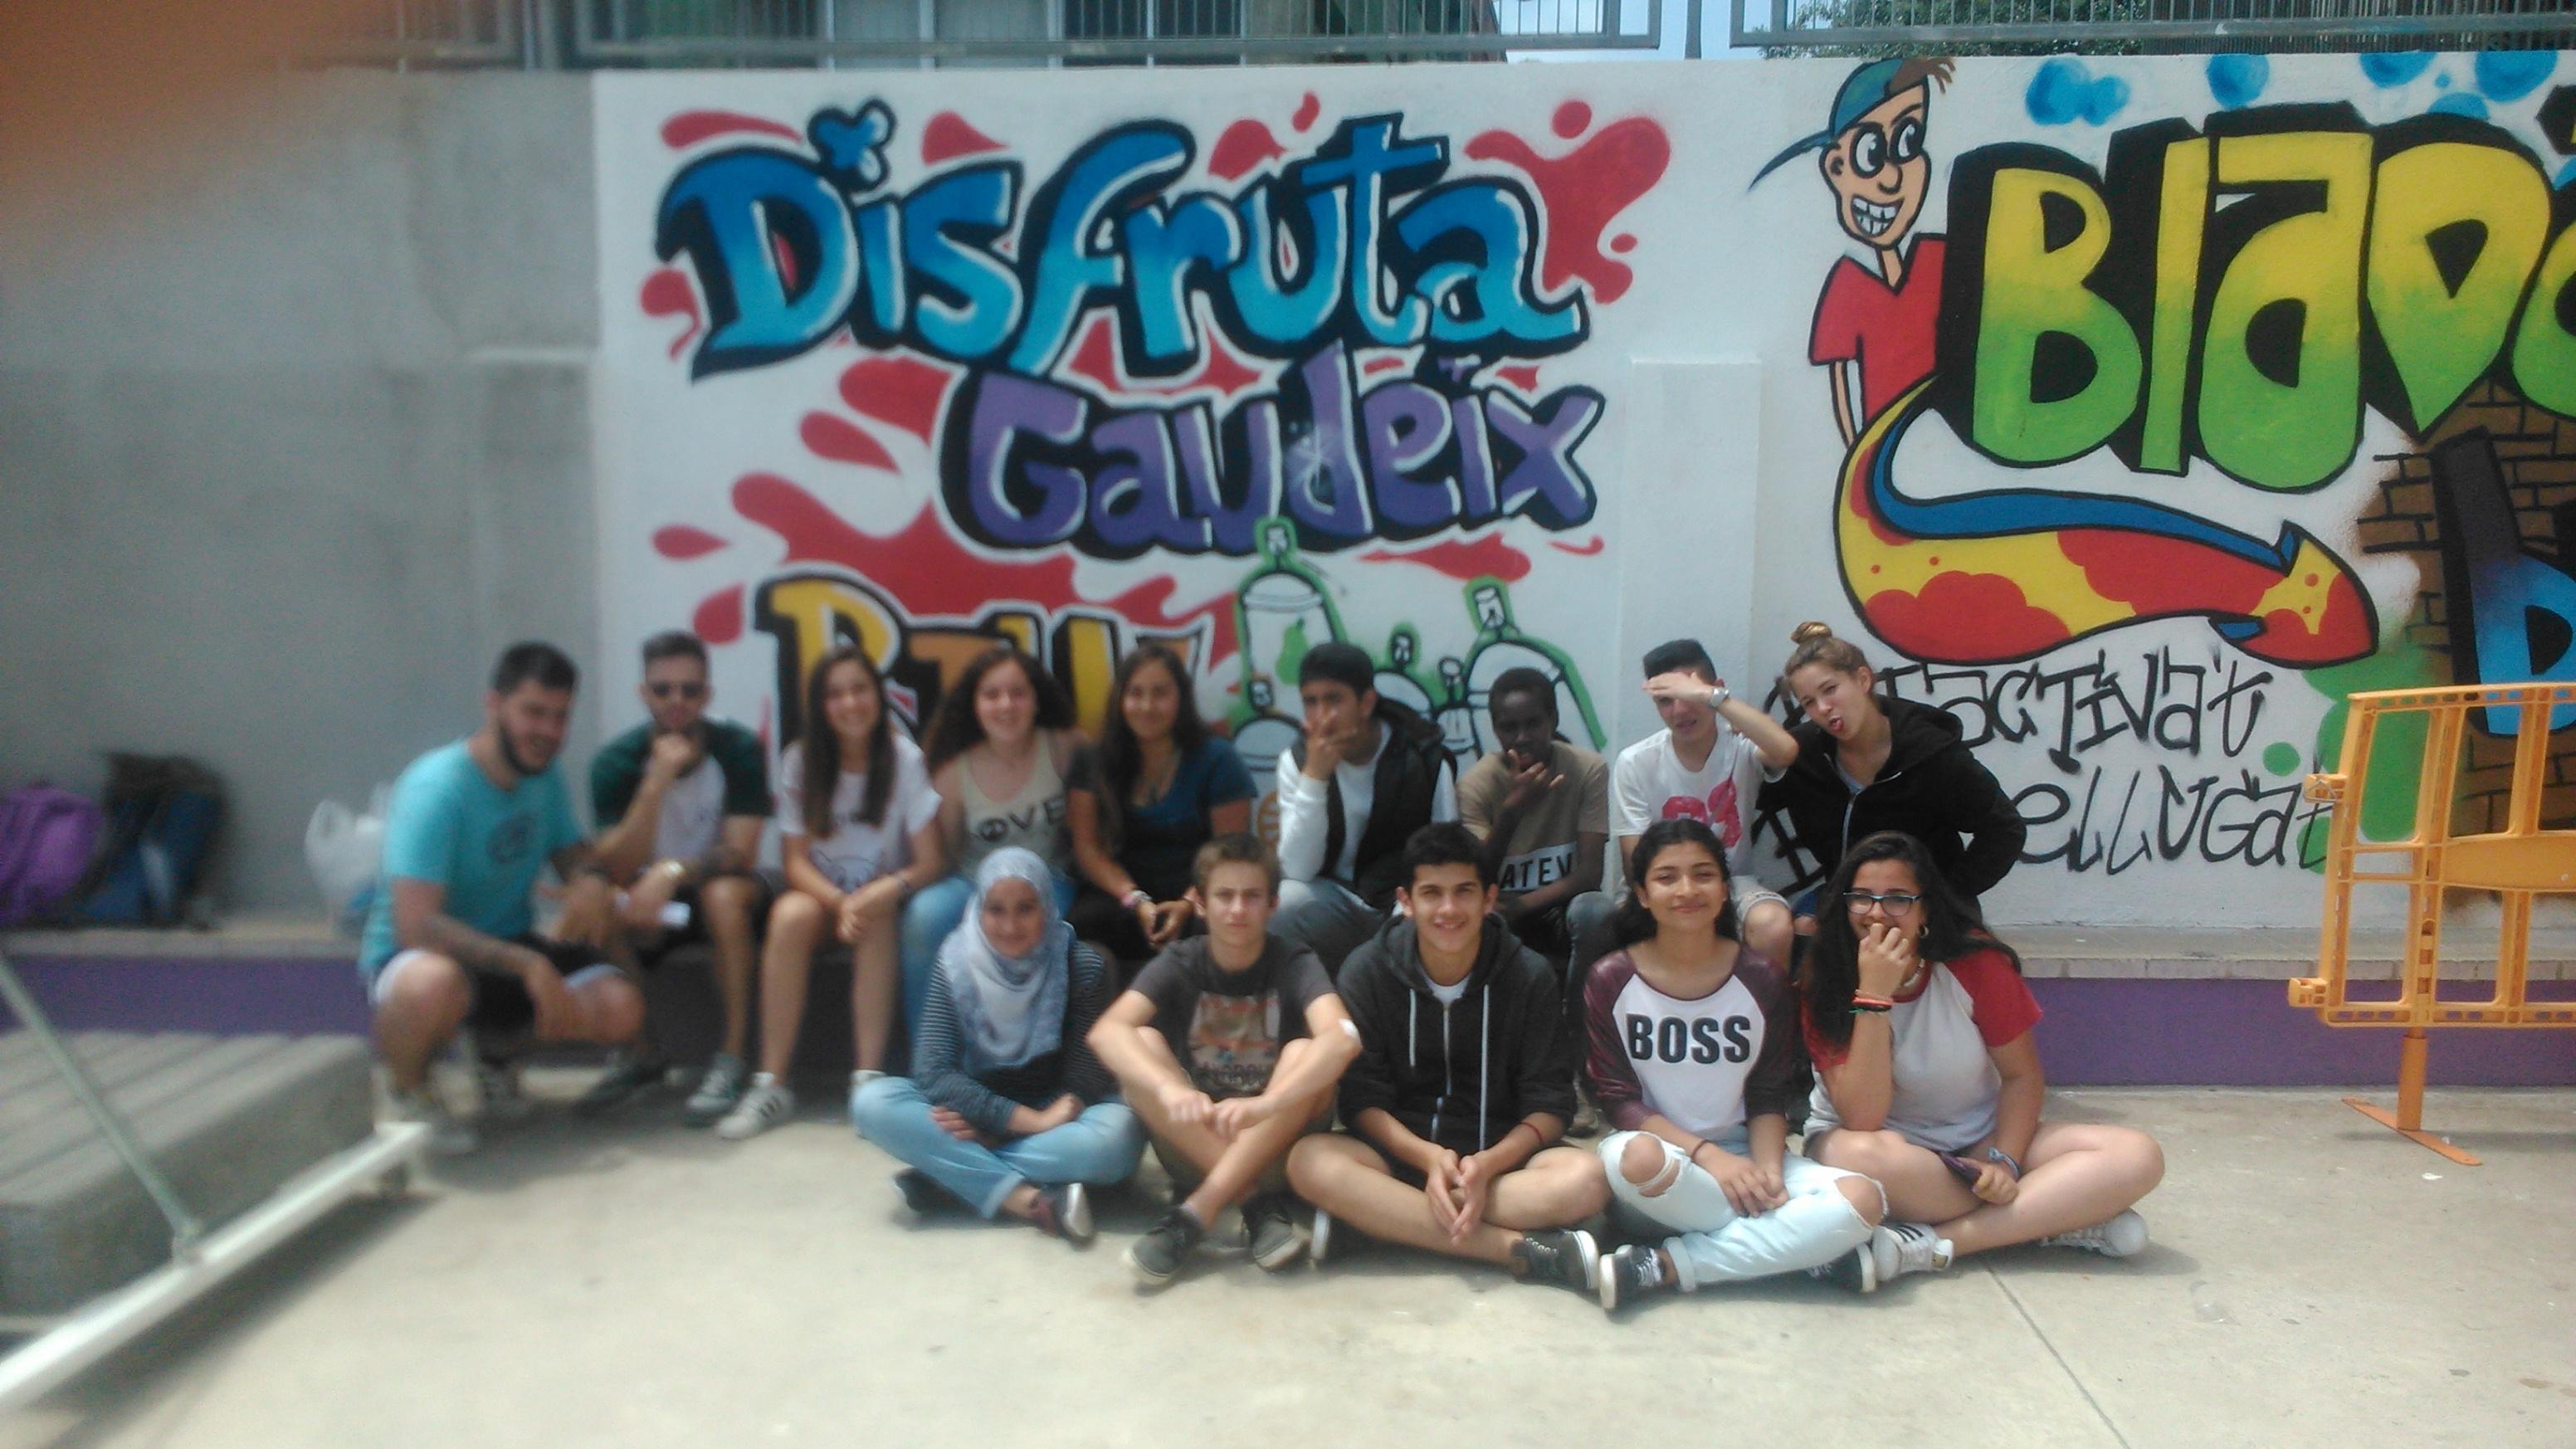 Hem pintat un altre grafiti al pati!